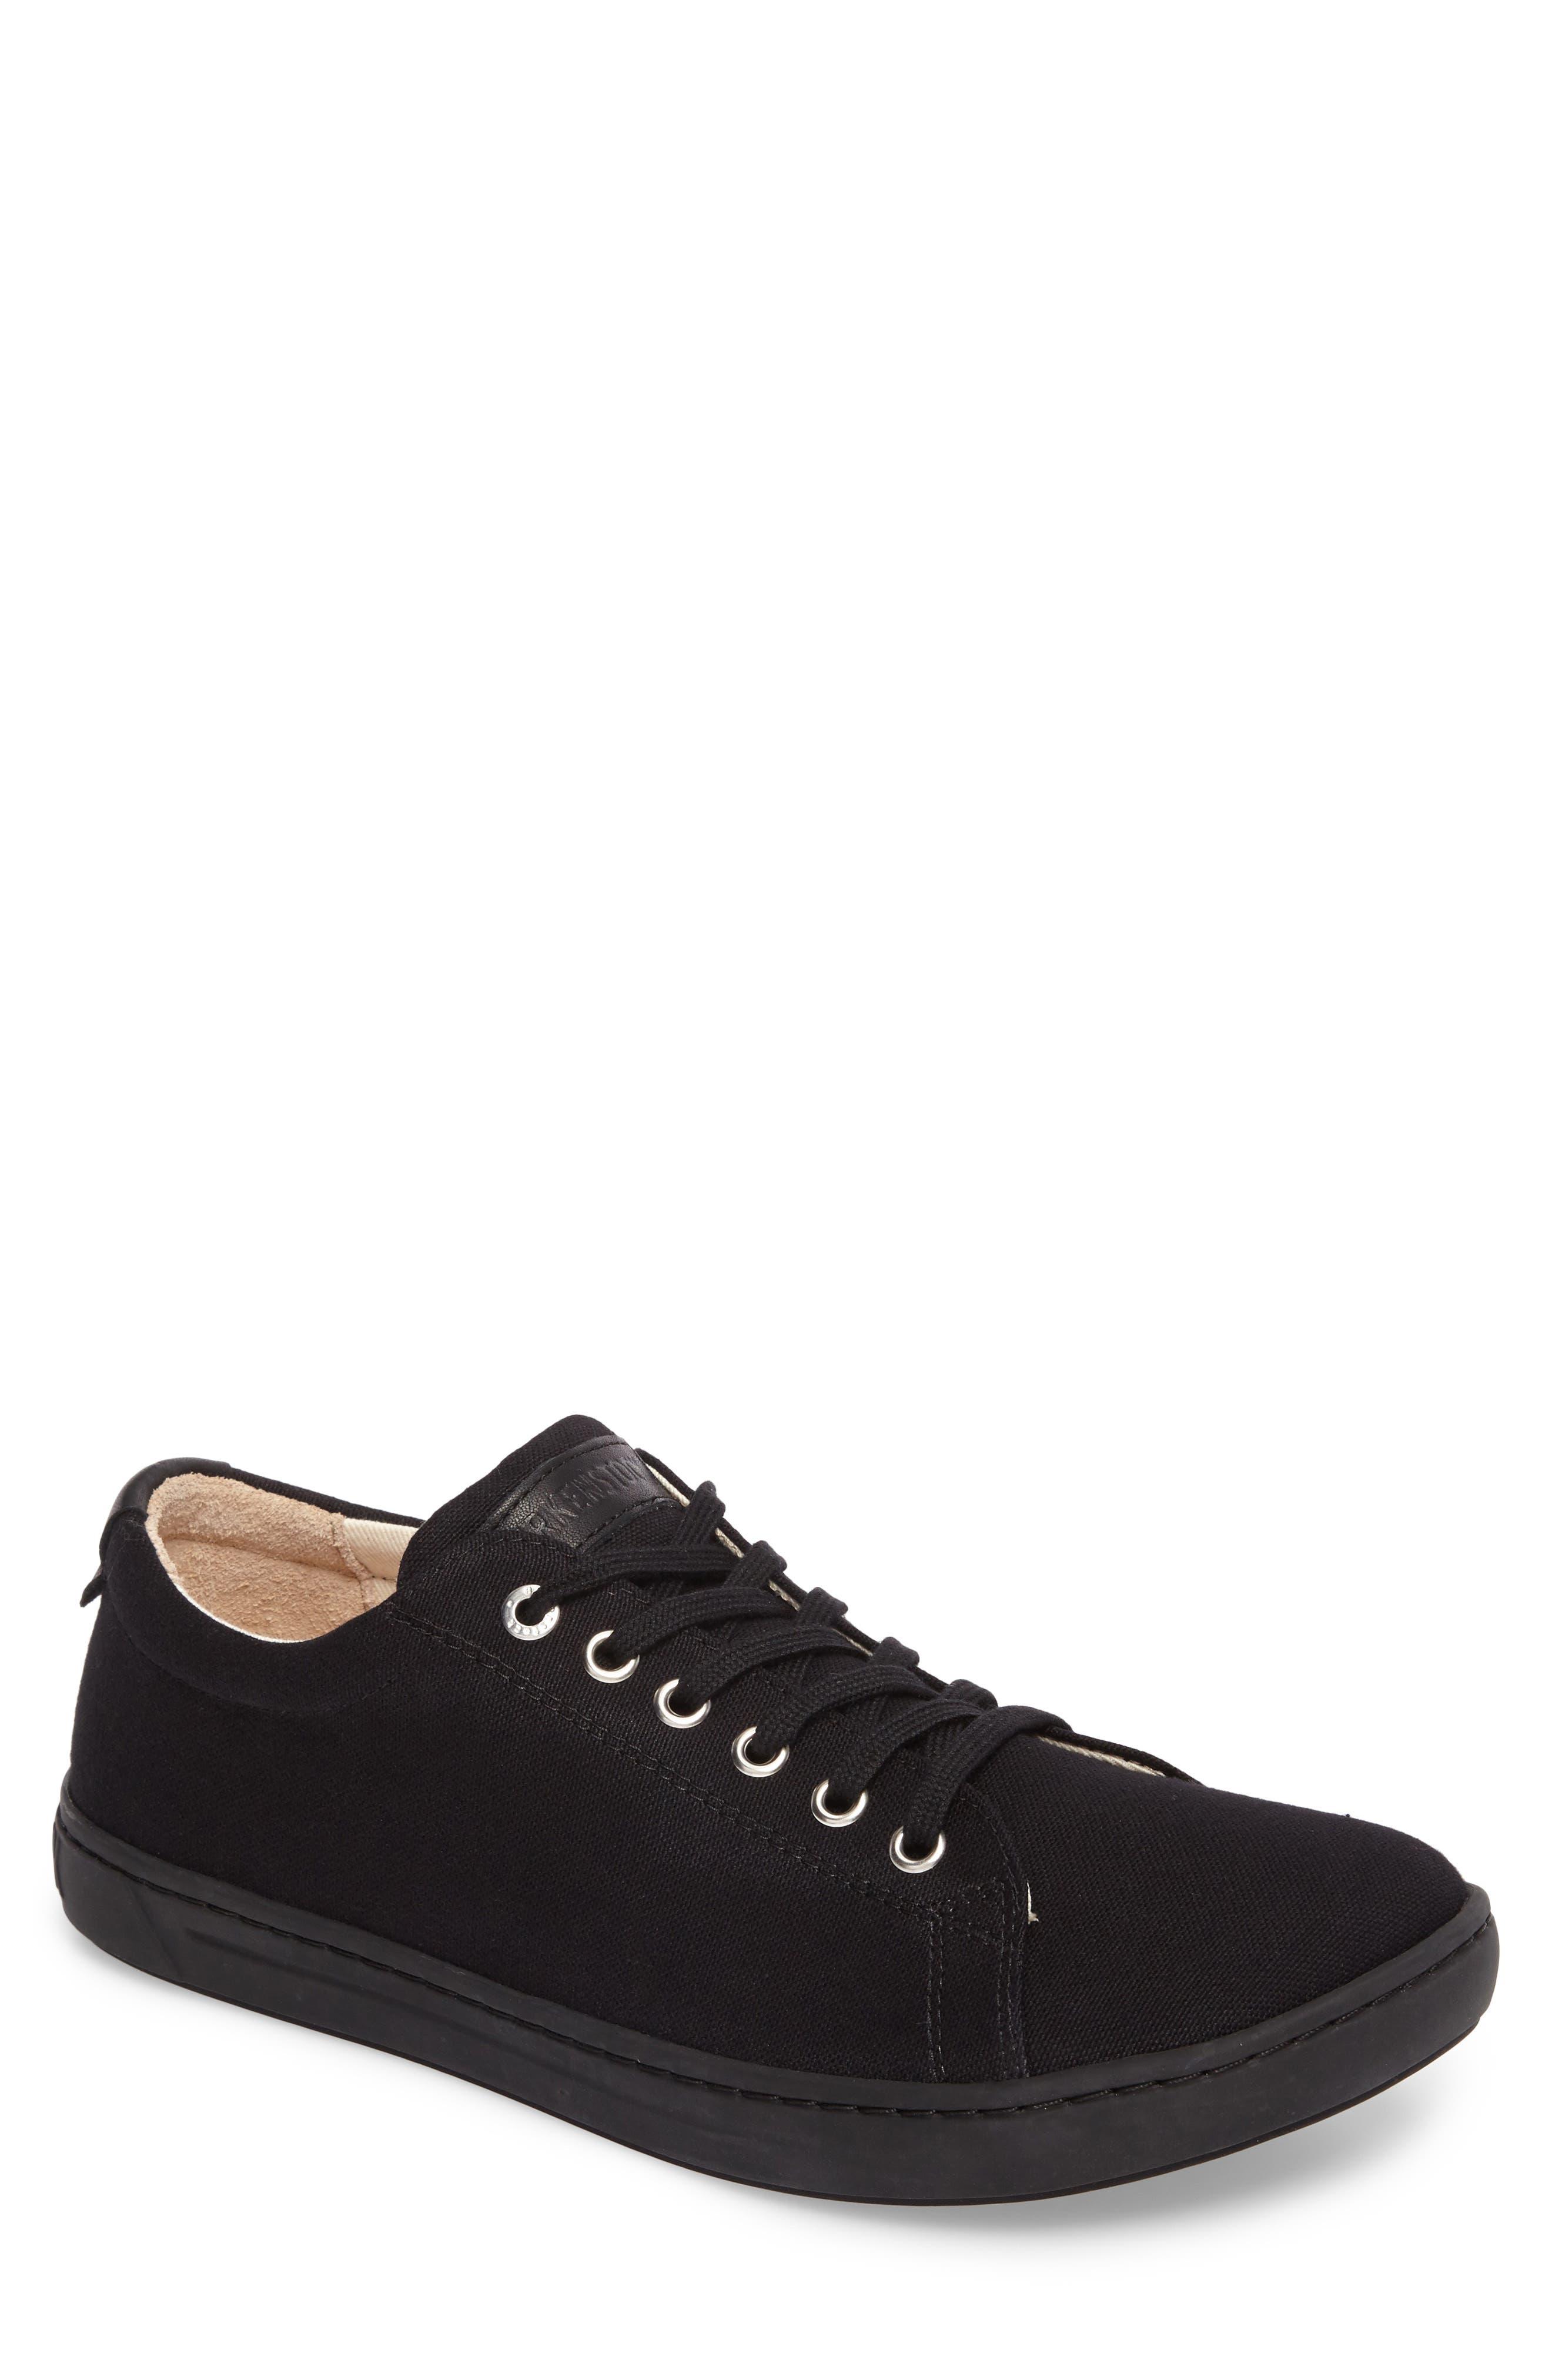 Arran Sneaker,                             Main thumbnail 1, color,                             001